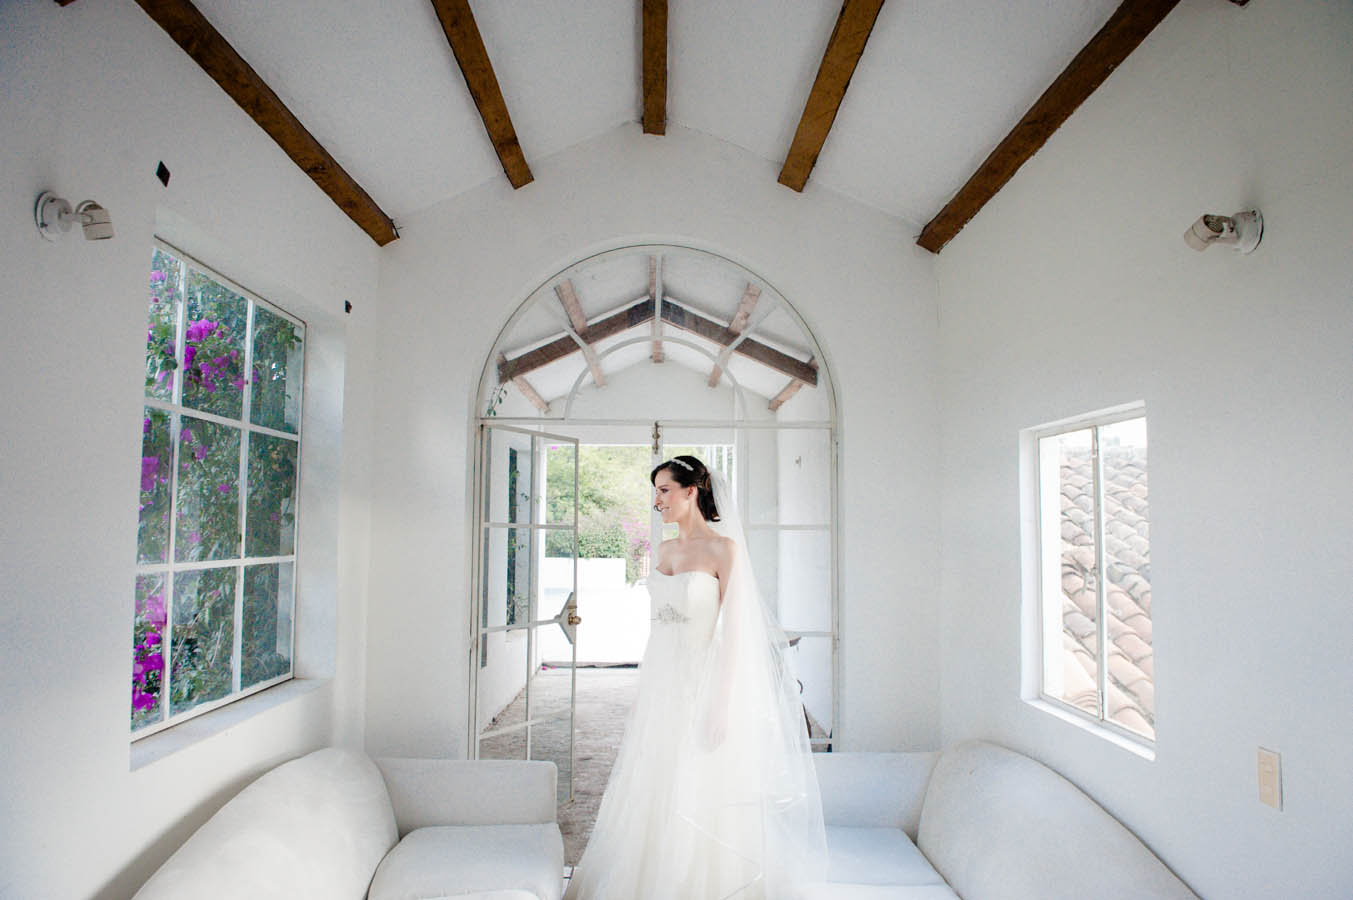 boda en hacienda pozo chico 05